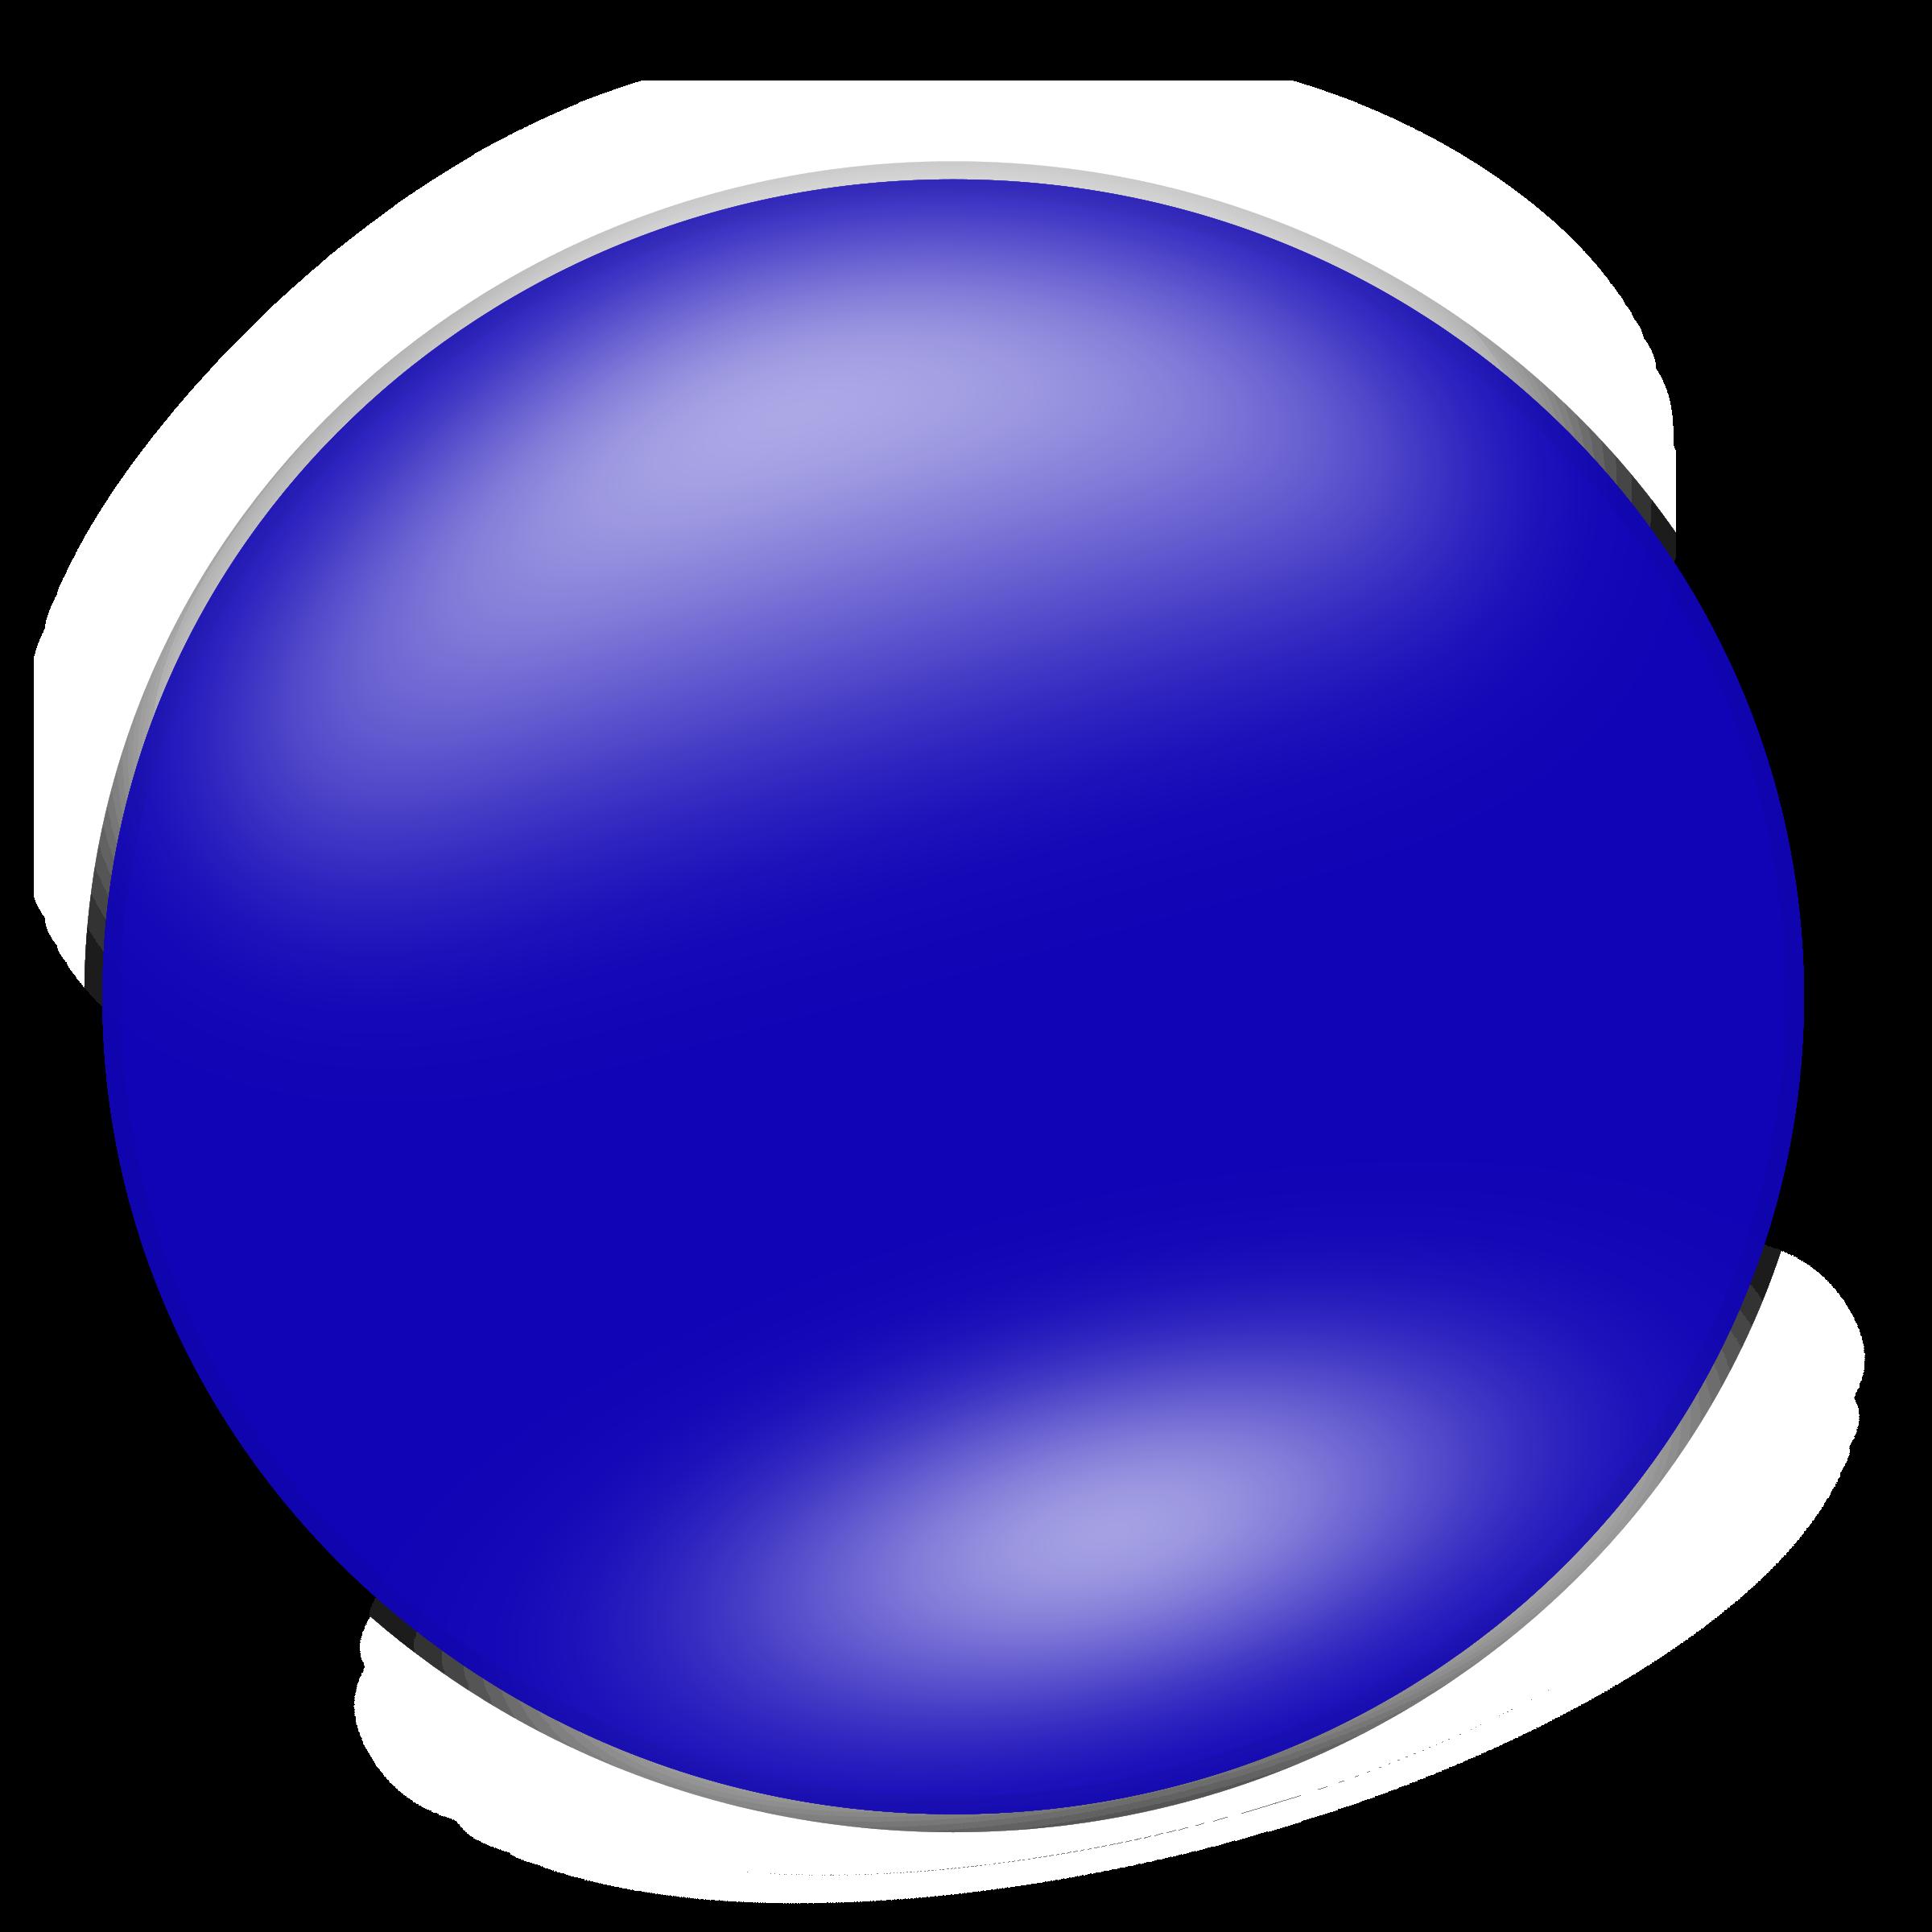 Shapes clipart circle. Blue